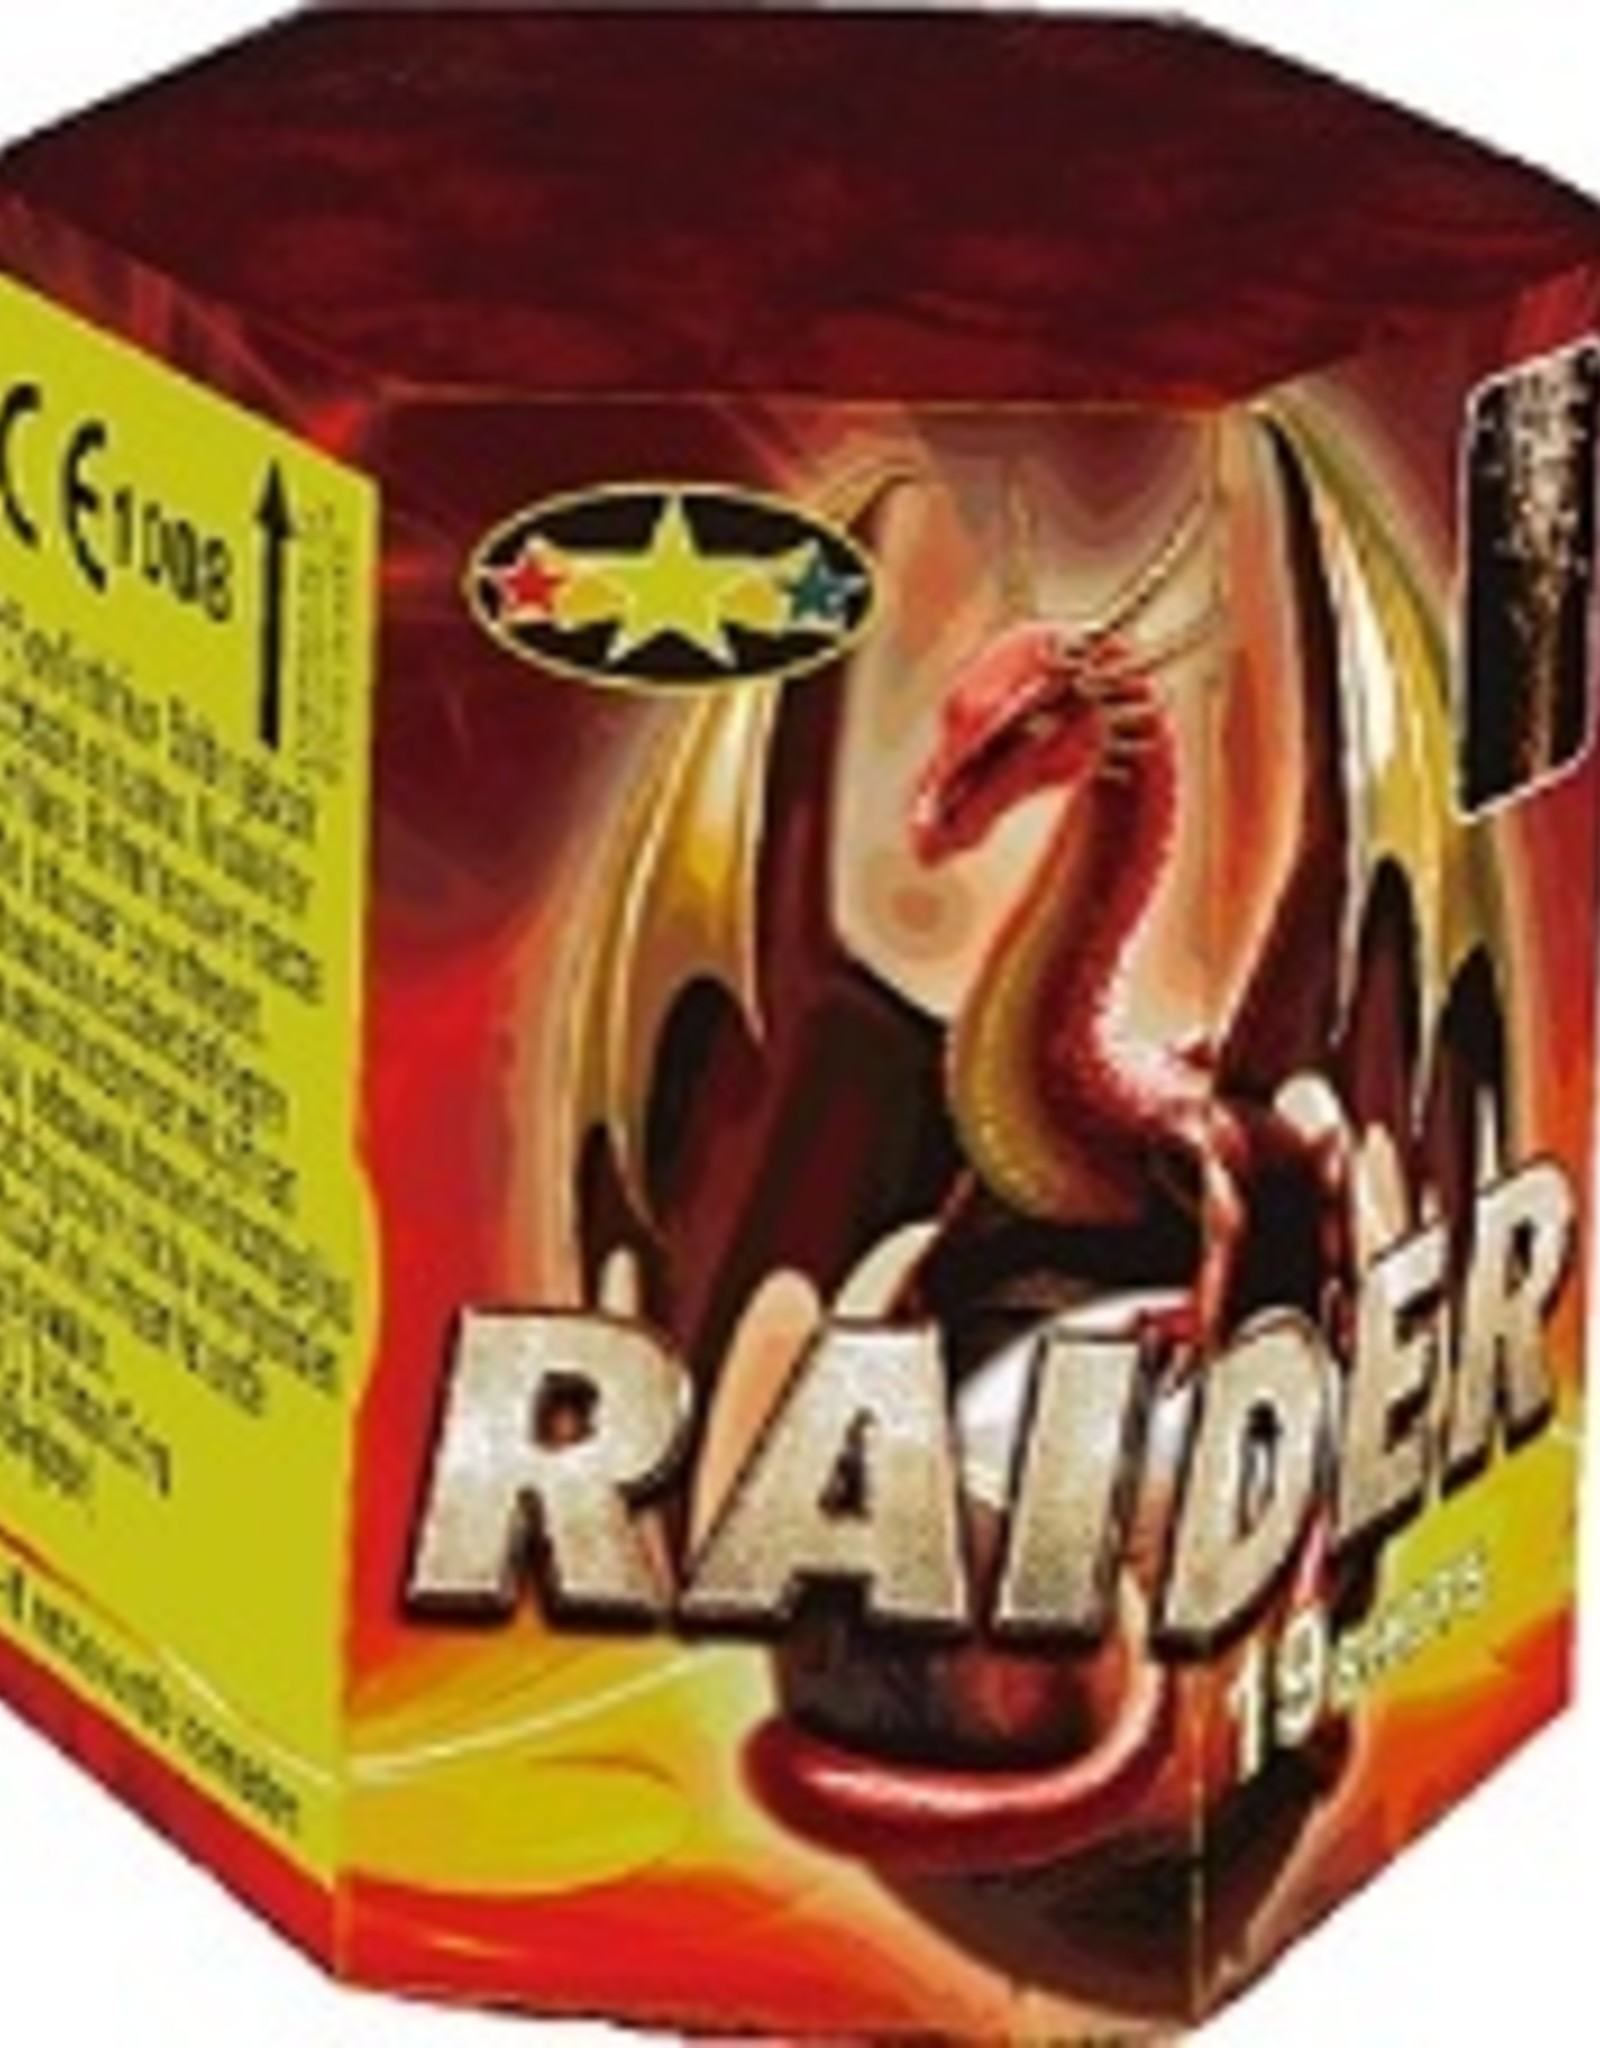 TRISTAR Raider 19 shot